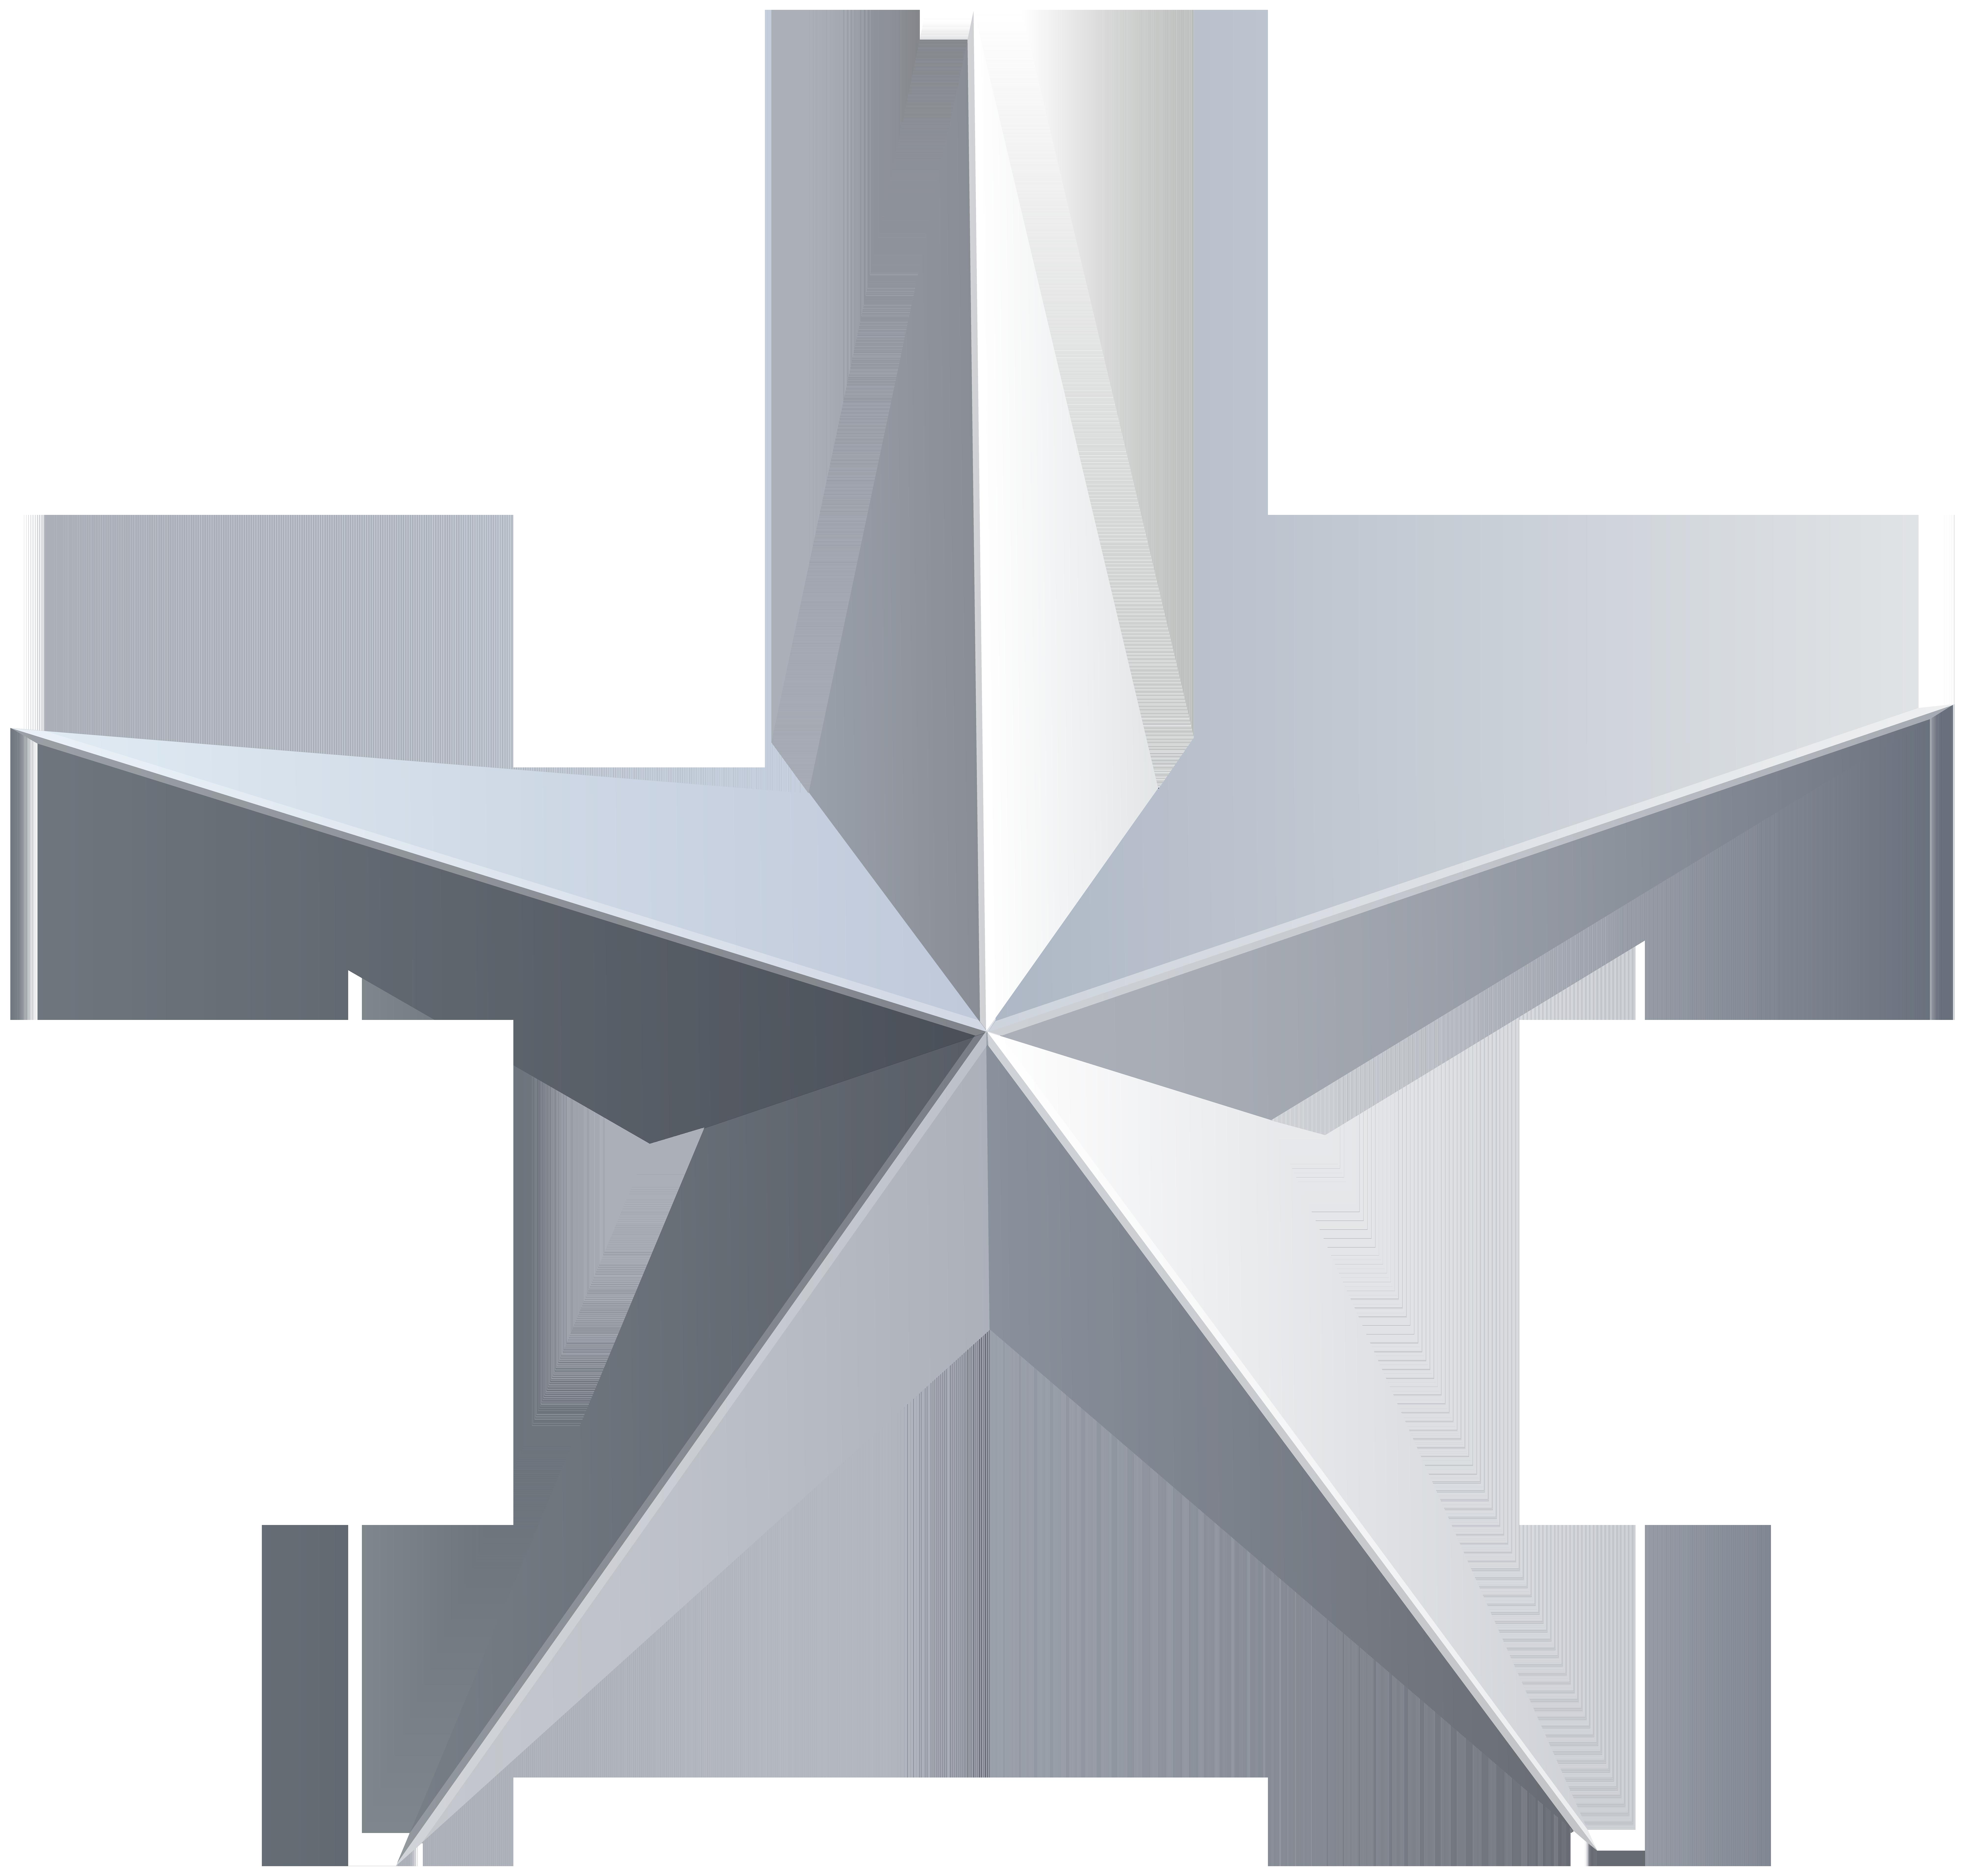 Silver Star Transparent PNG Clip Art.